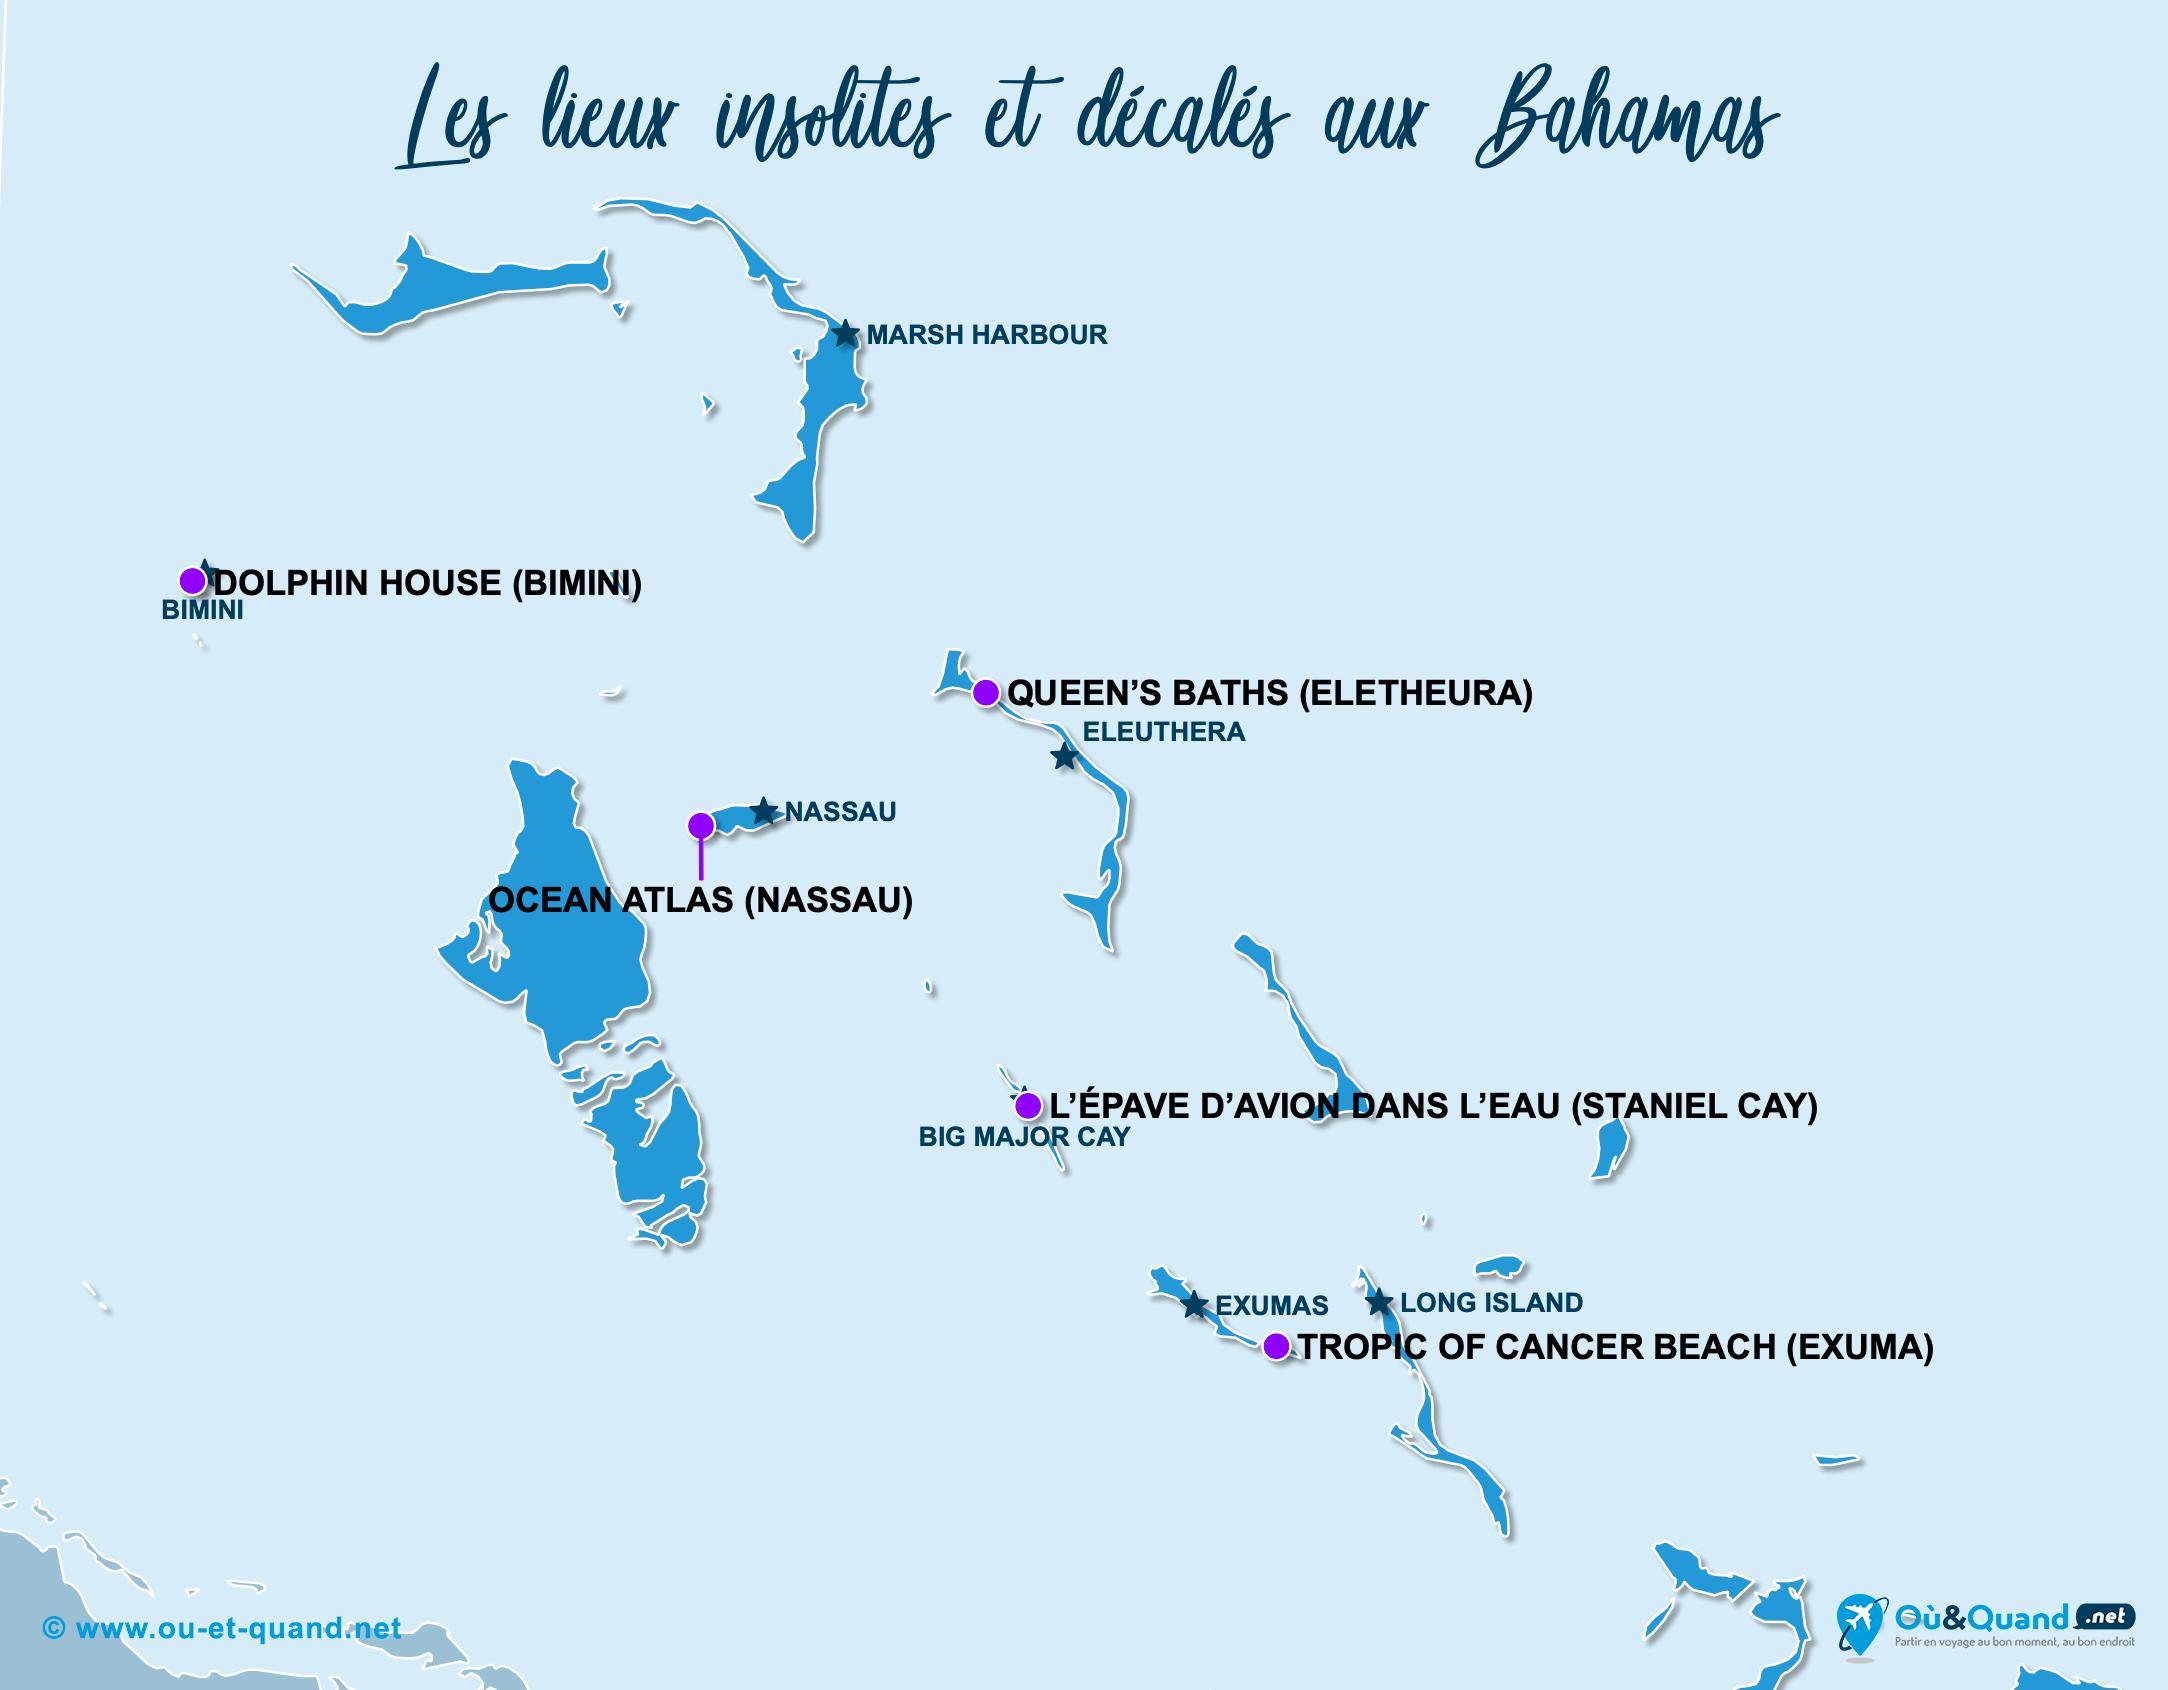 Carte Bahamas : Les Bahamas insolite